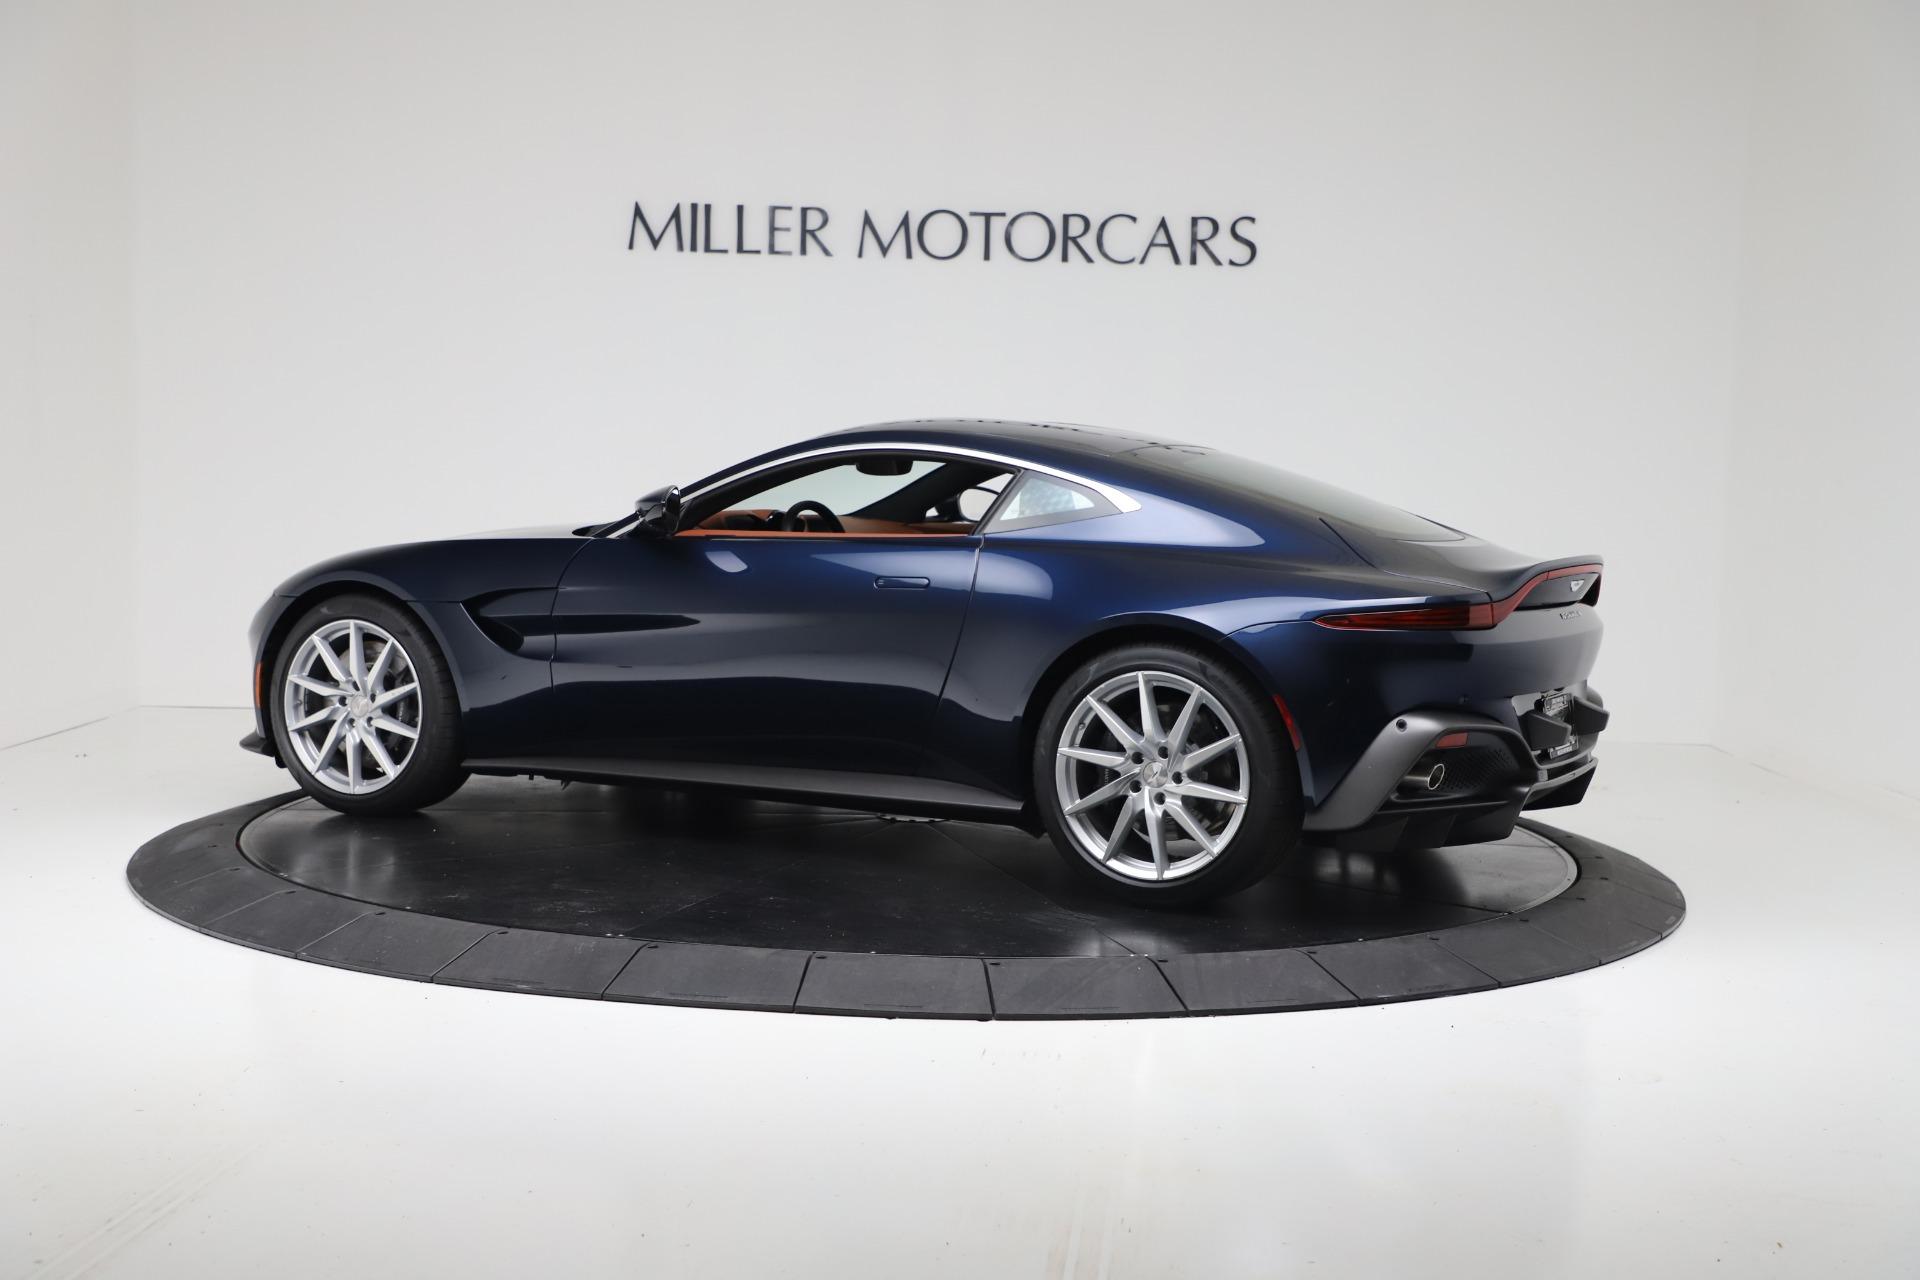 New 2020 Aston Martin Vantage V8 For Sale In Greenwich, CT 3378_p4